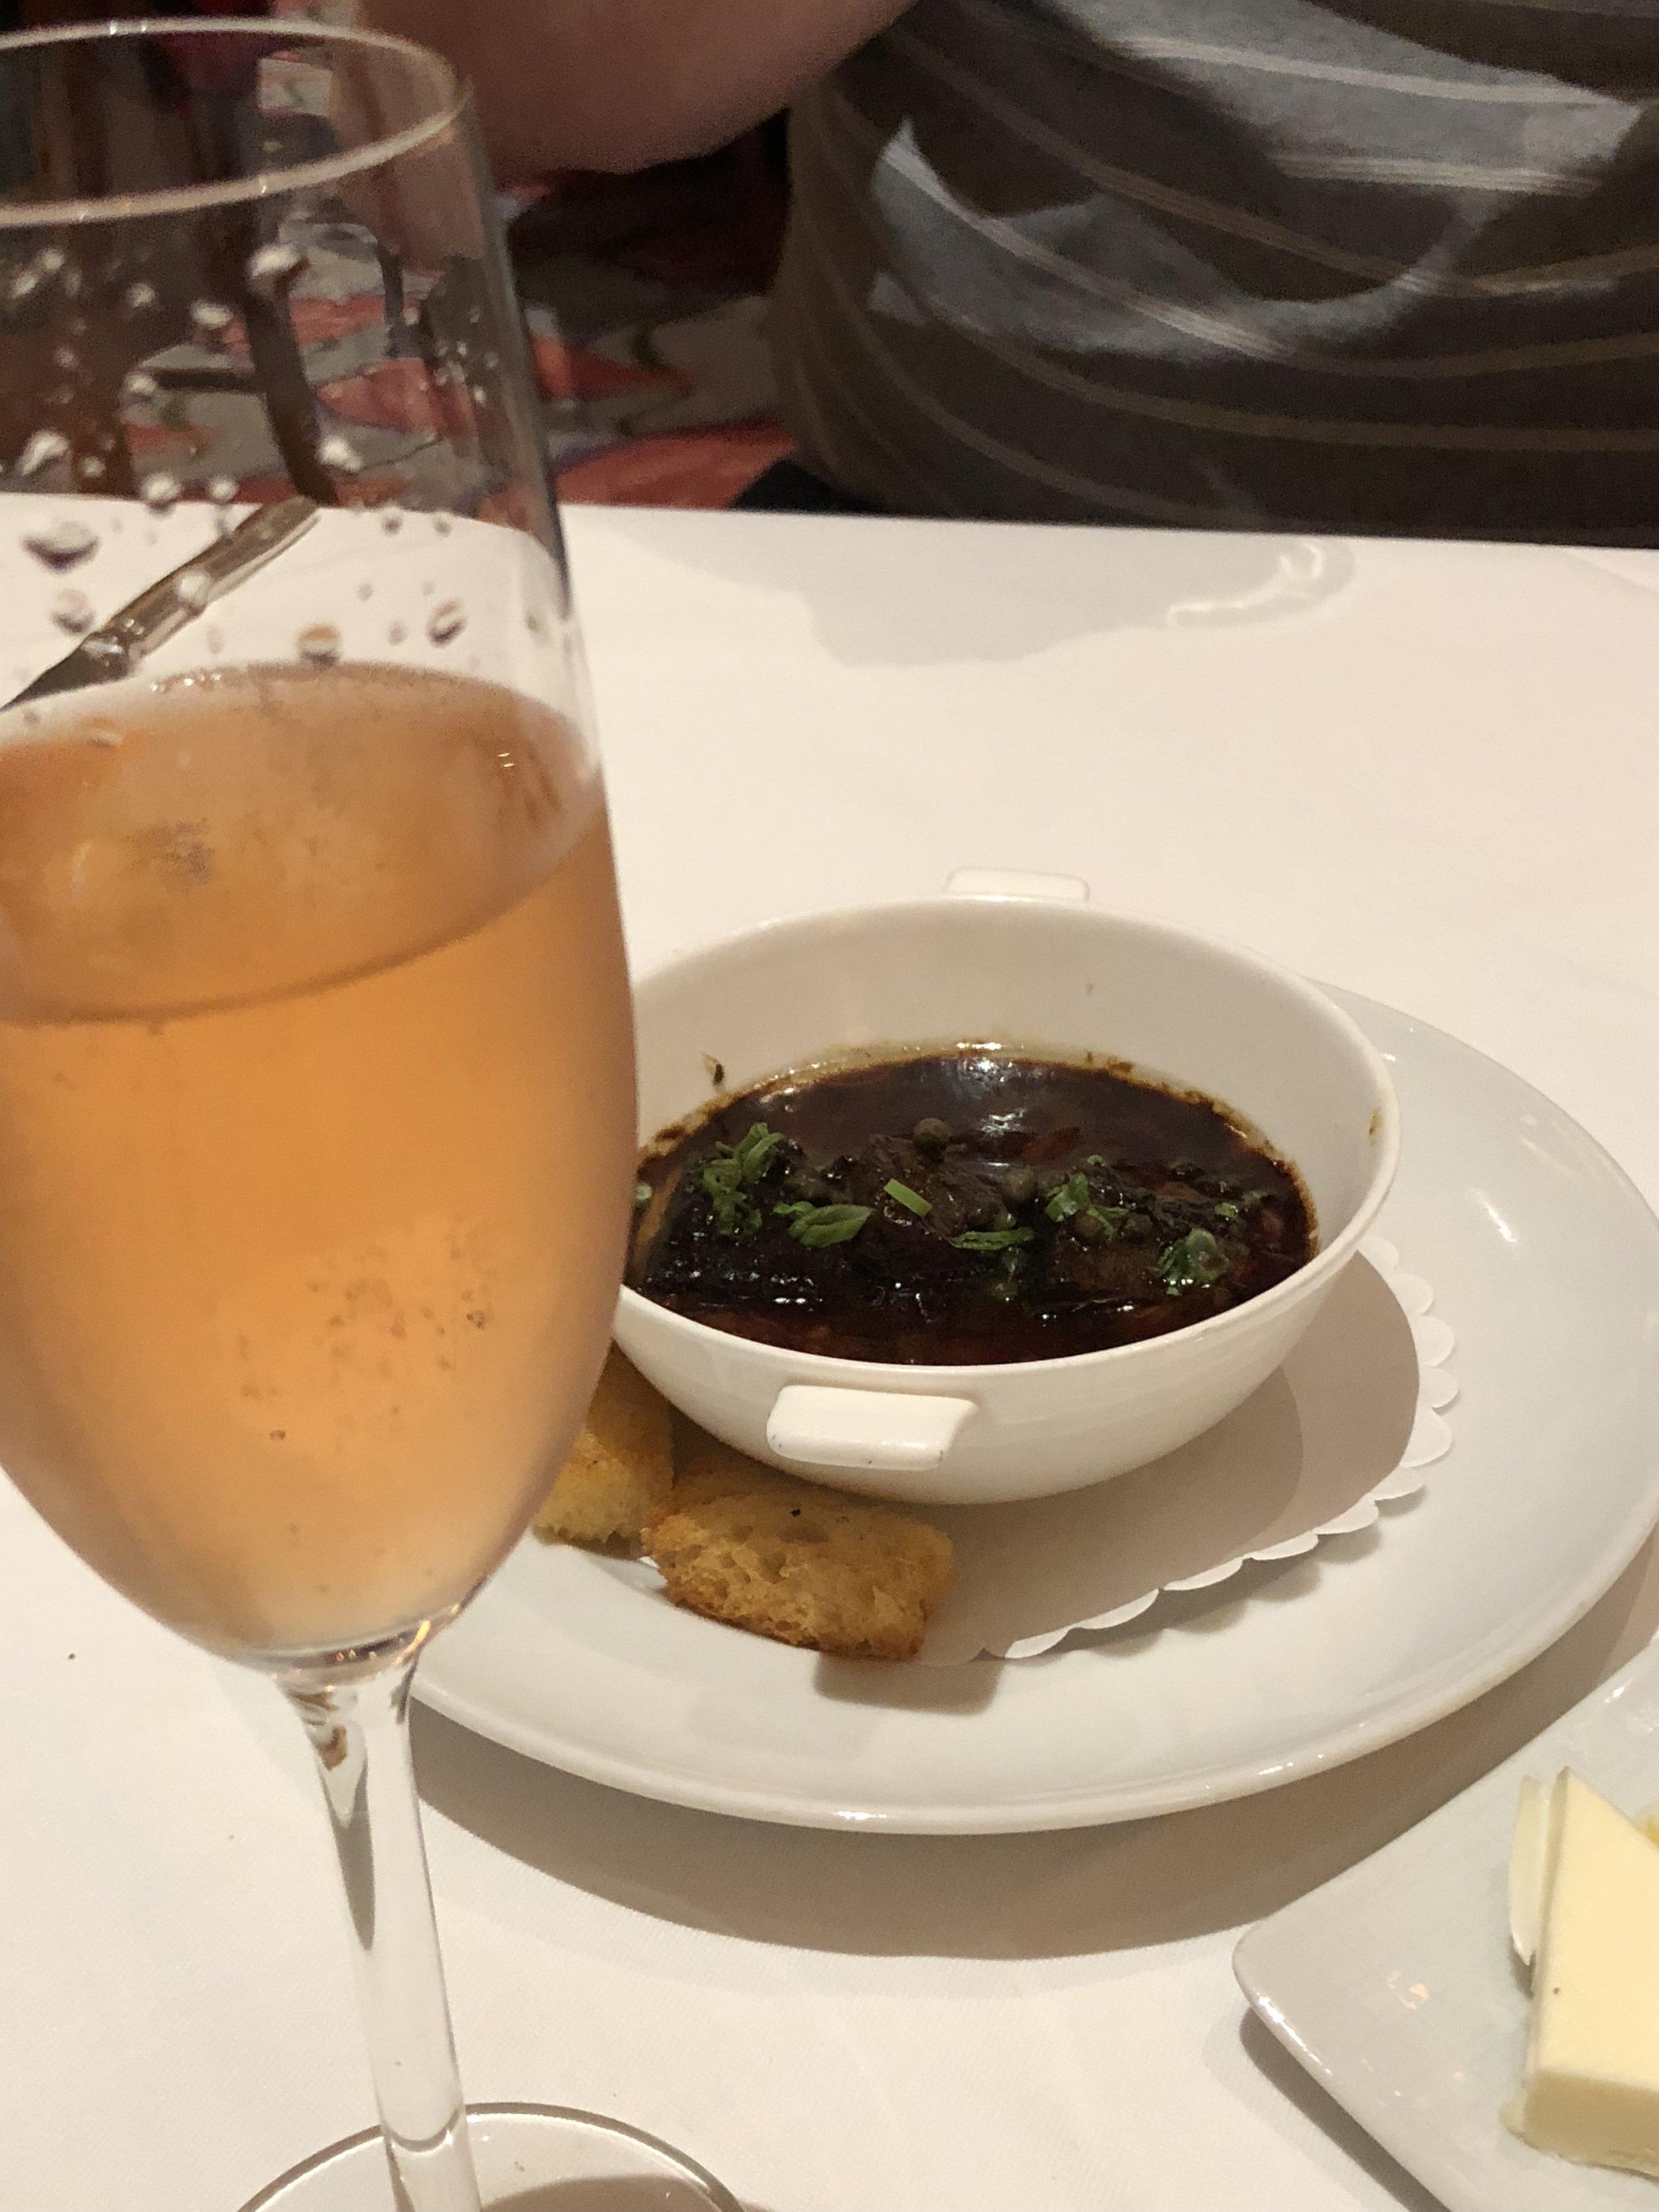 Warm Bone Marrow Custard with Braised Kobe Beef Cheeks, Capers, Orange Gremolata, and Sourdough Croutons,